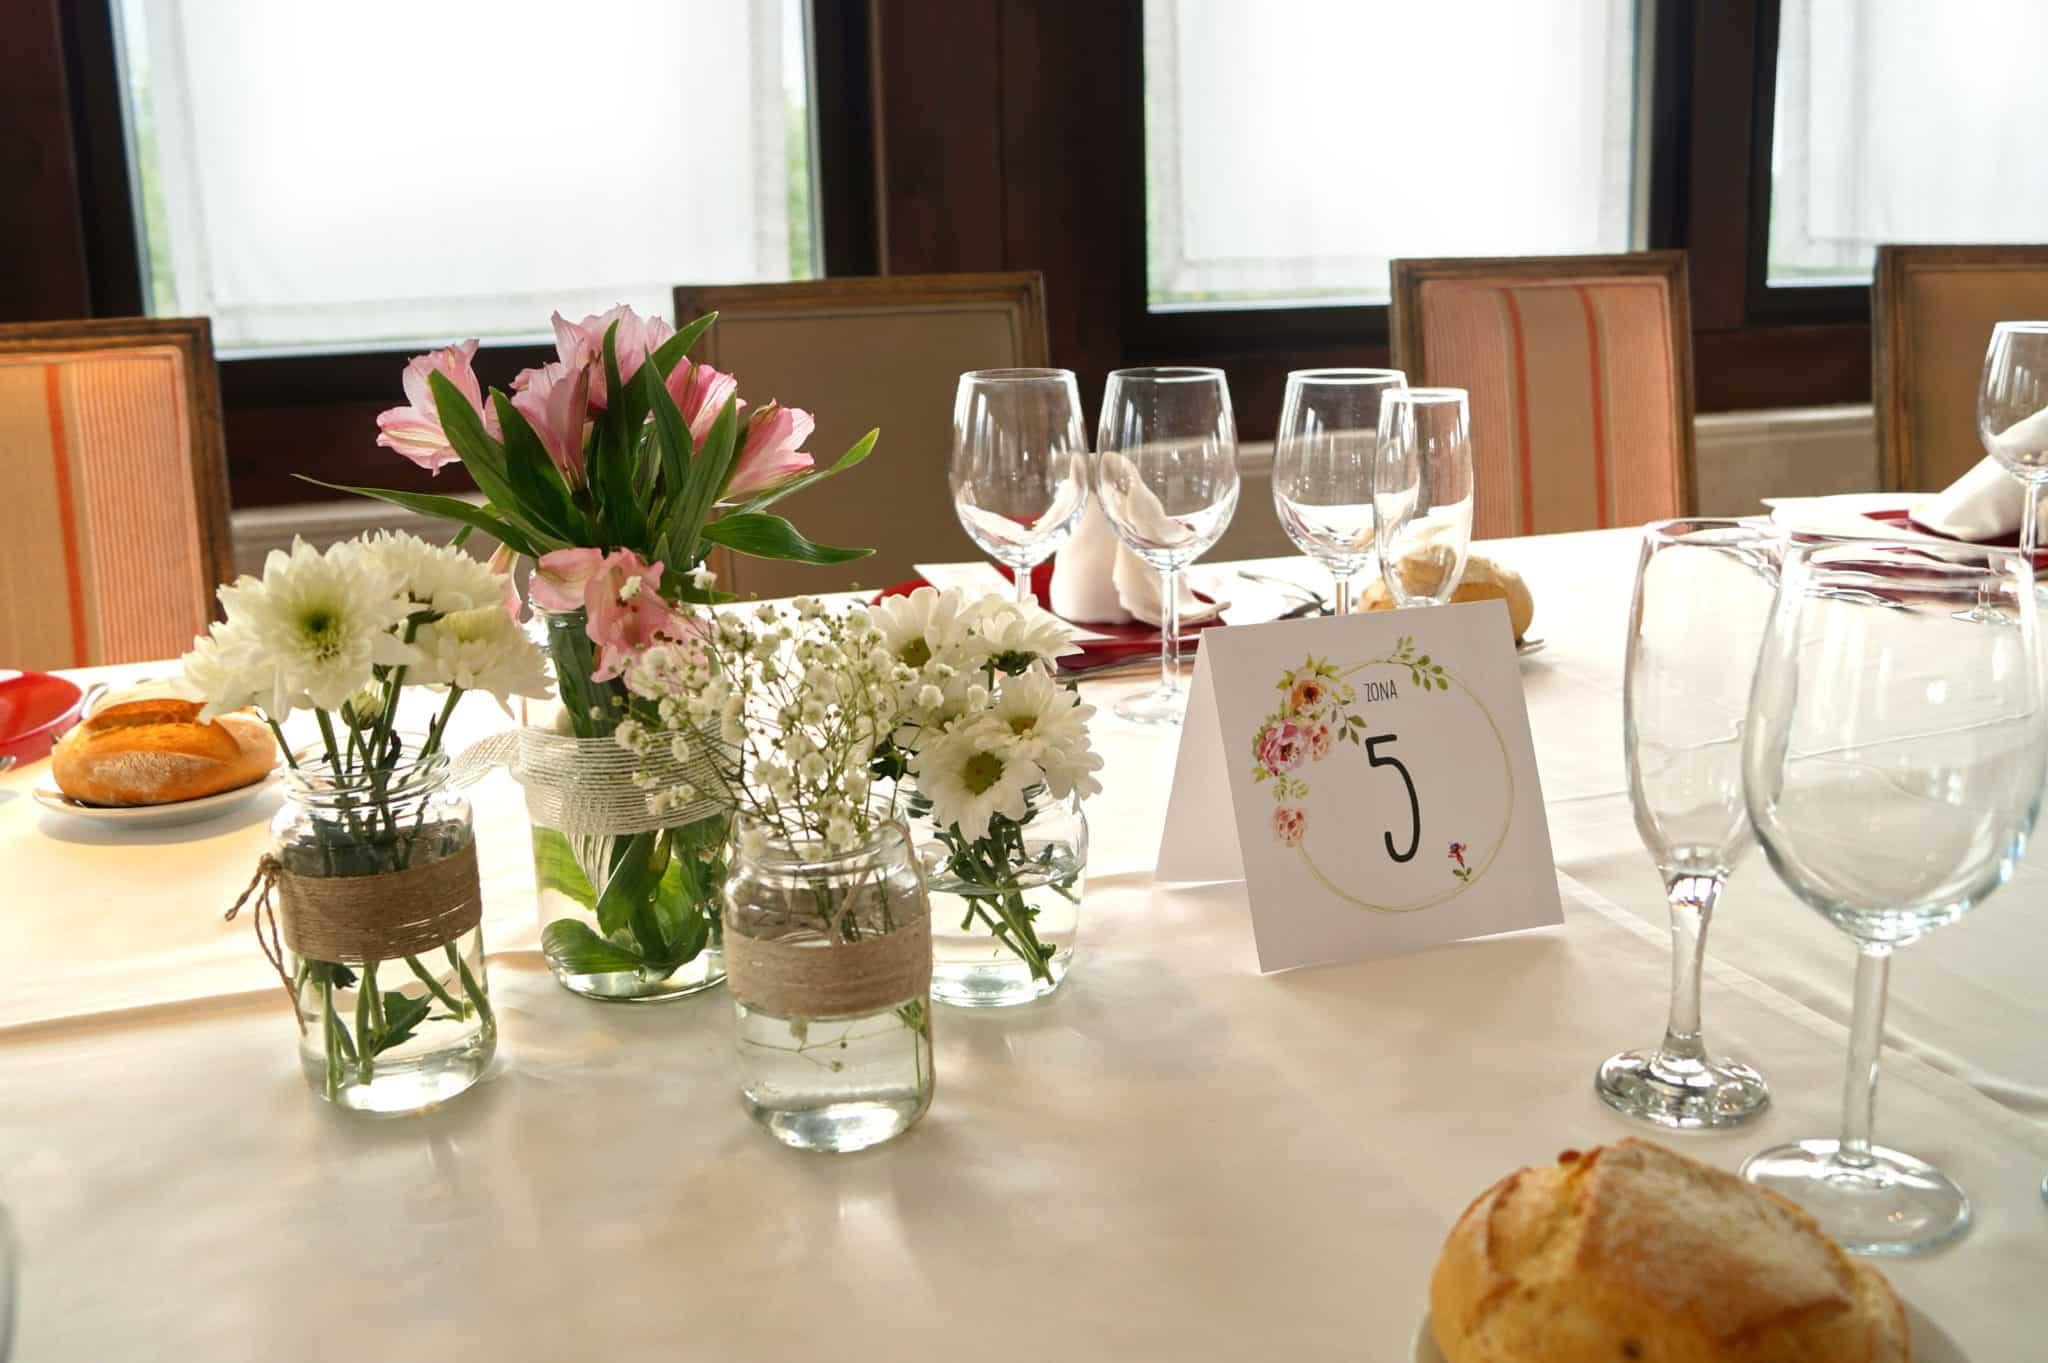 Centro de mesa y mesero de boda carlota y javi